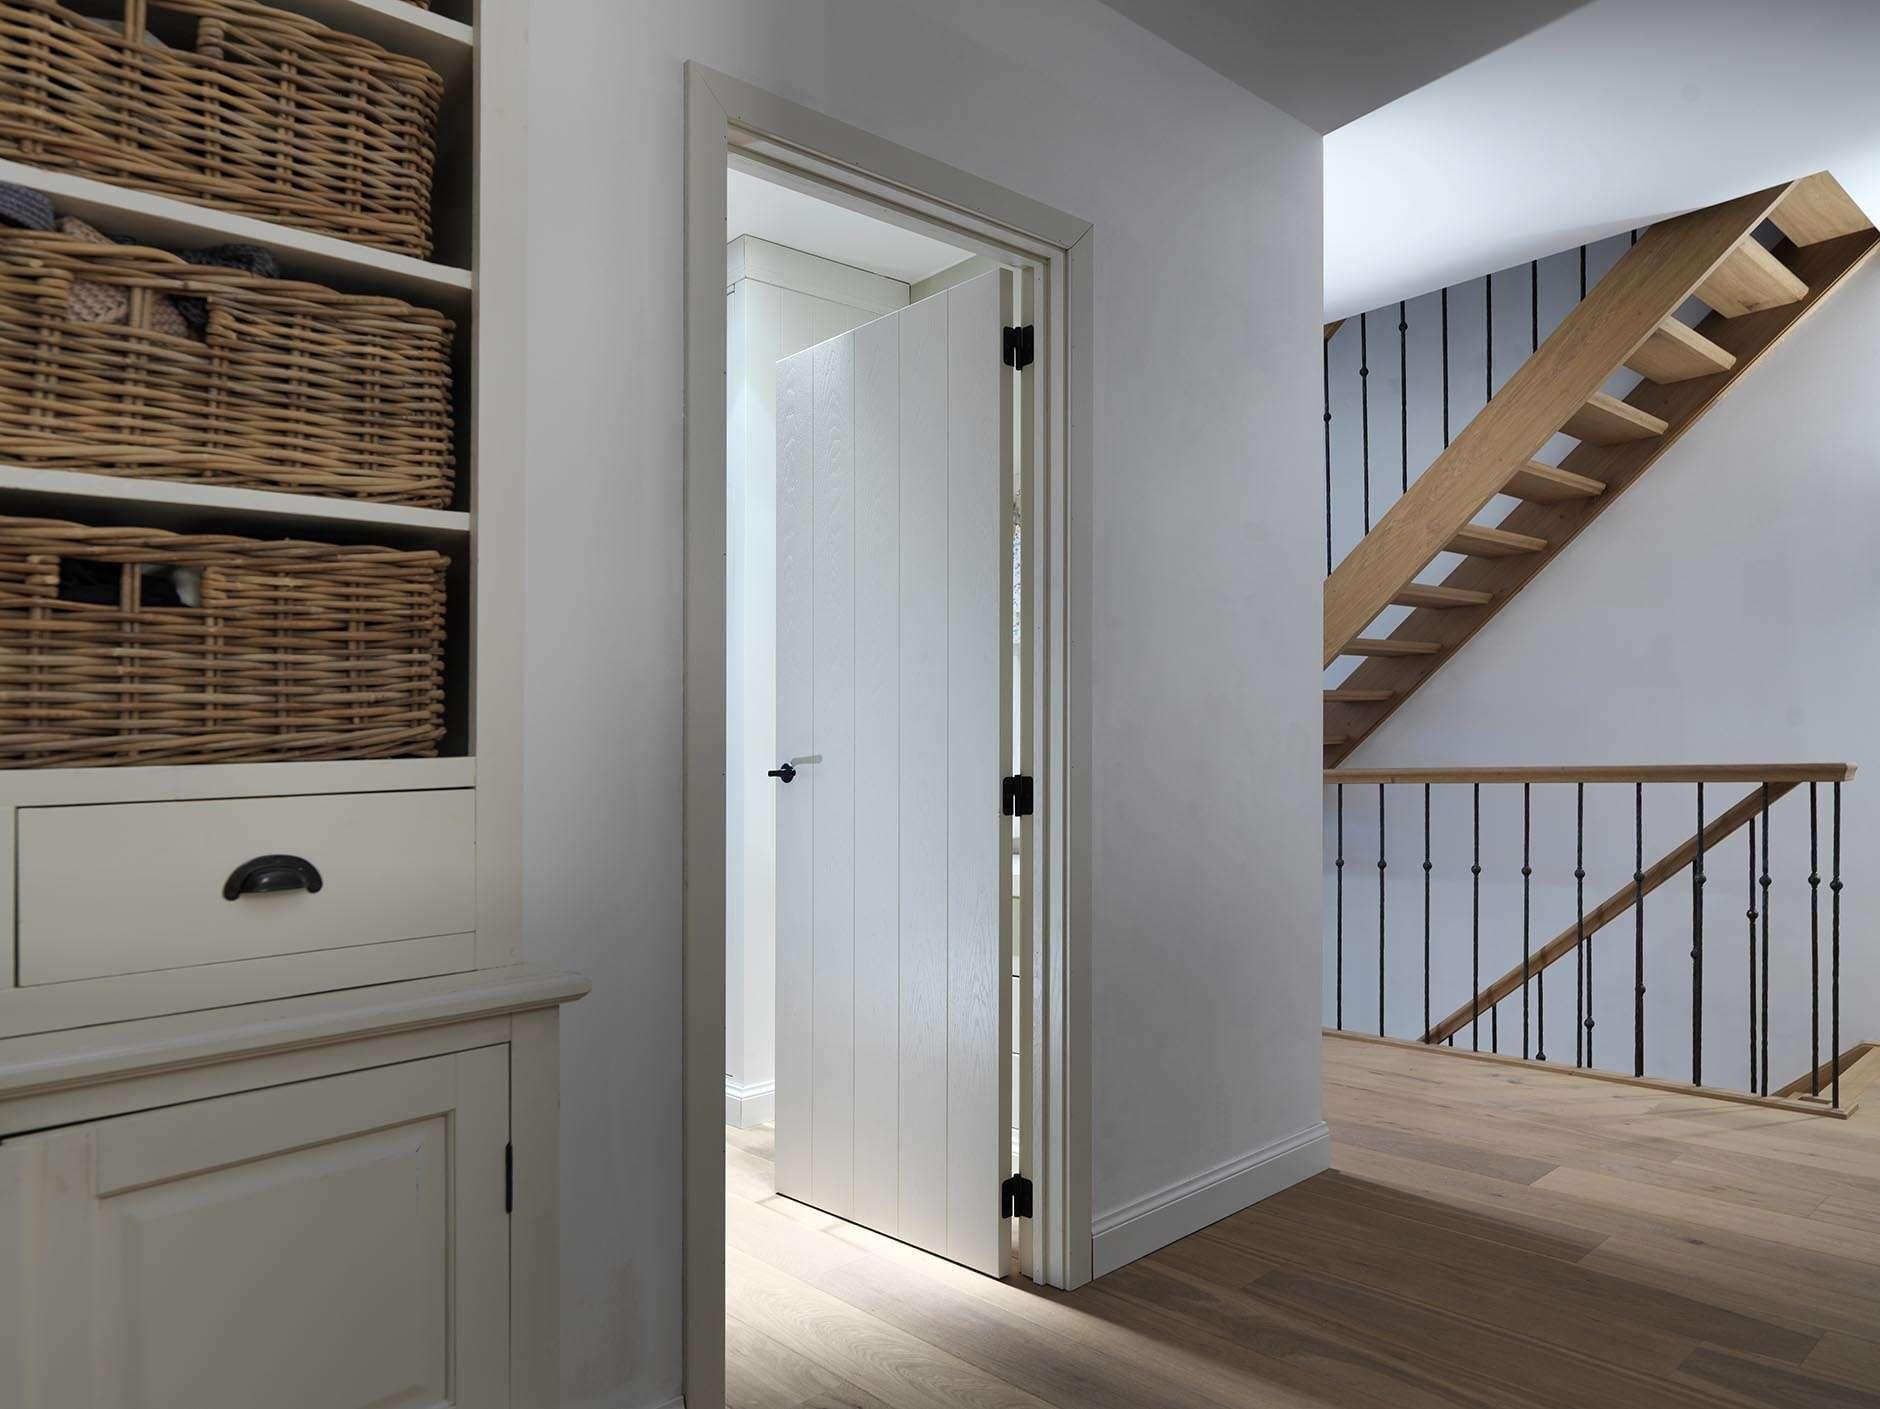 wit-gelakte-plankendeur-landelijk-interieur